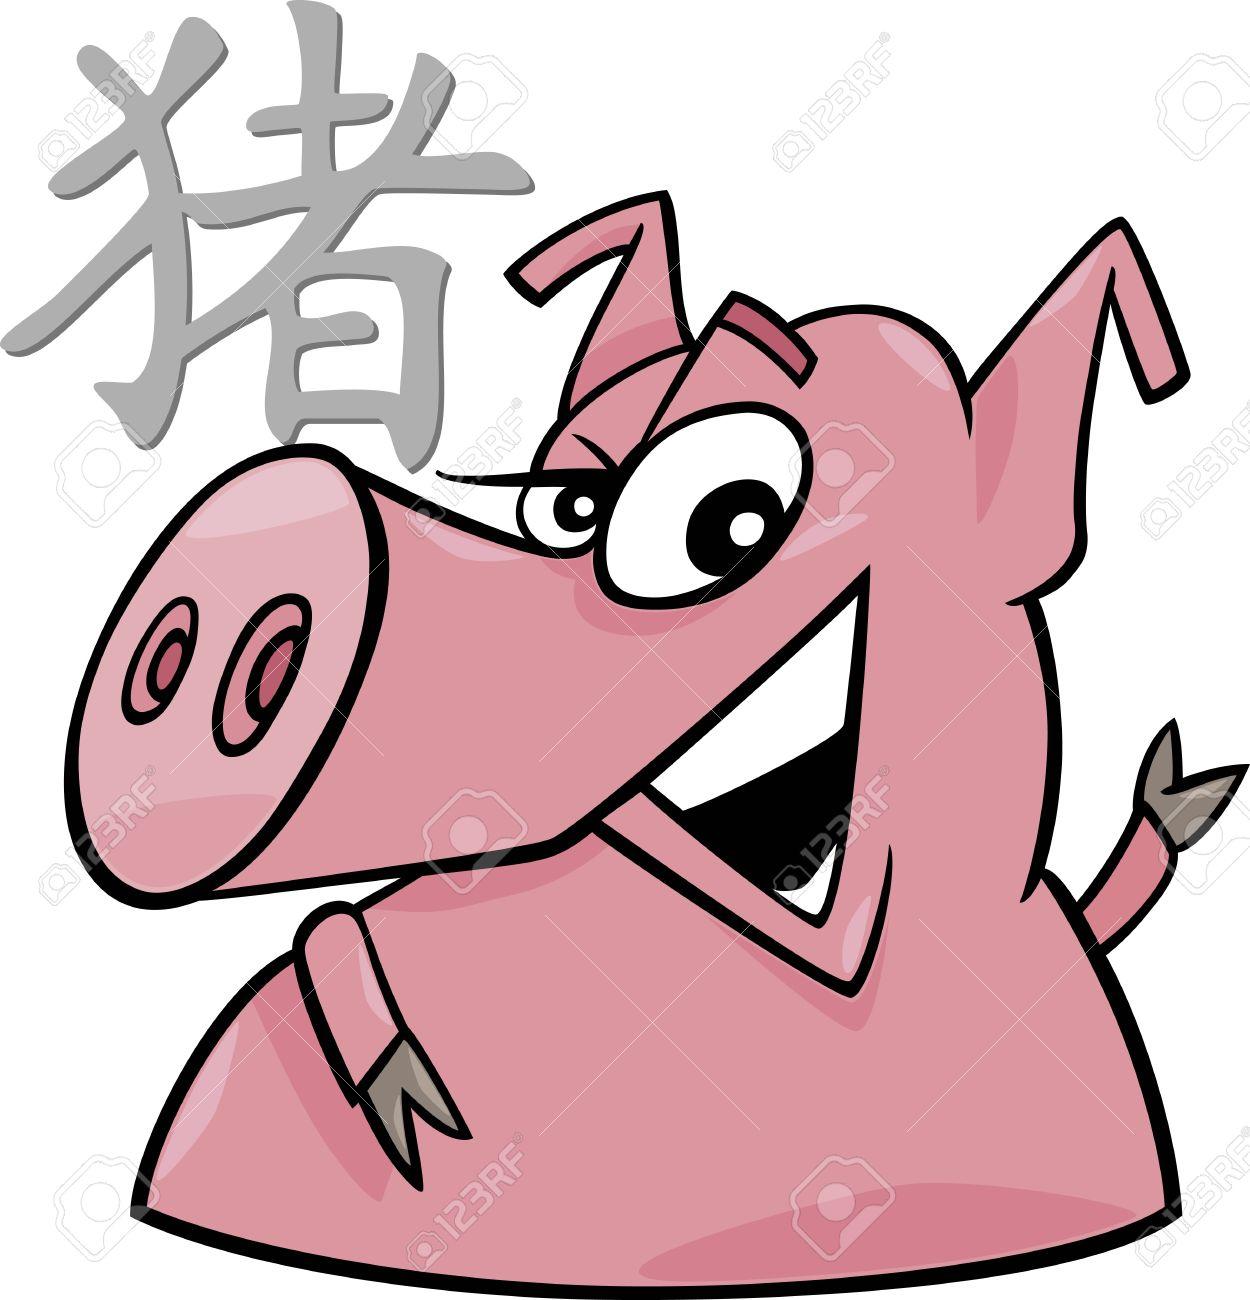 cartoon illustration of Pig Chinese horoscope sign Stock Vector - 12938482